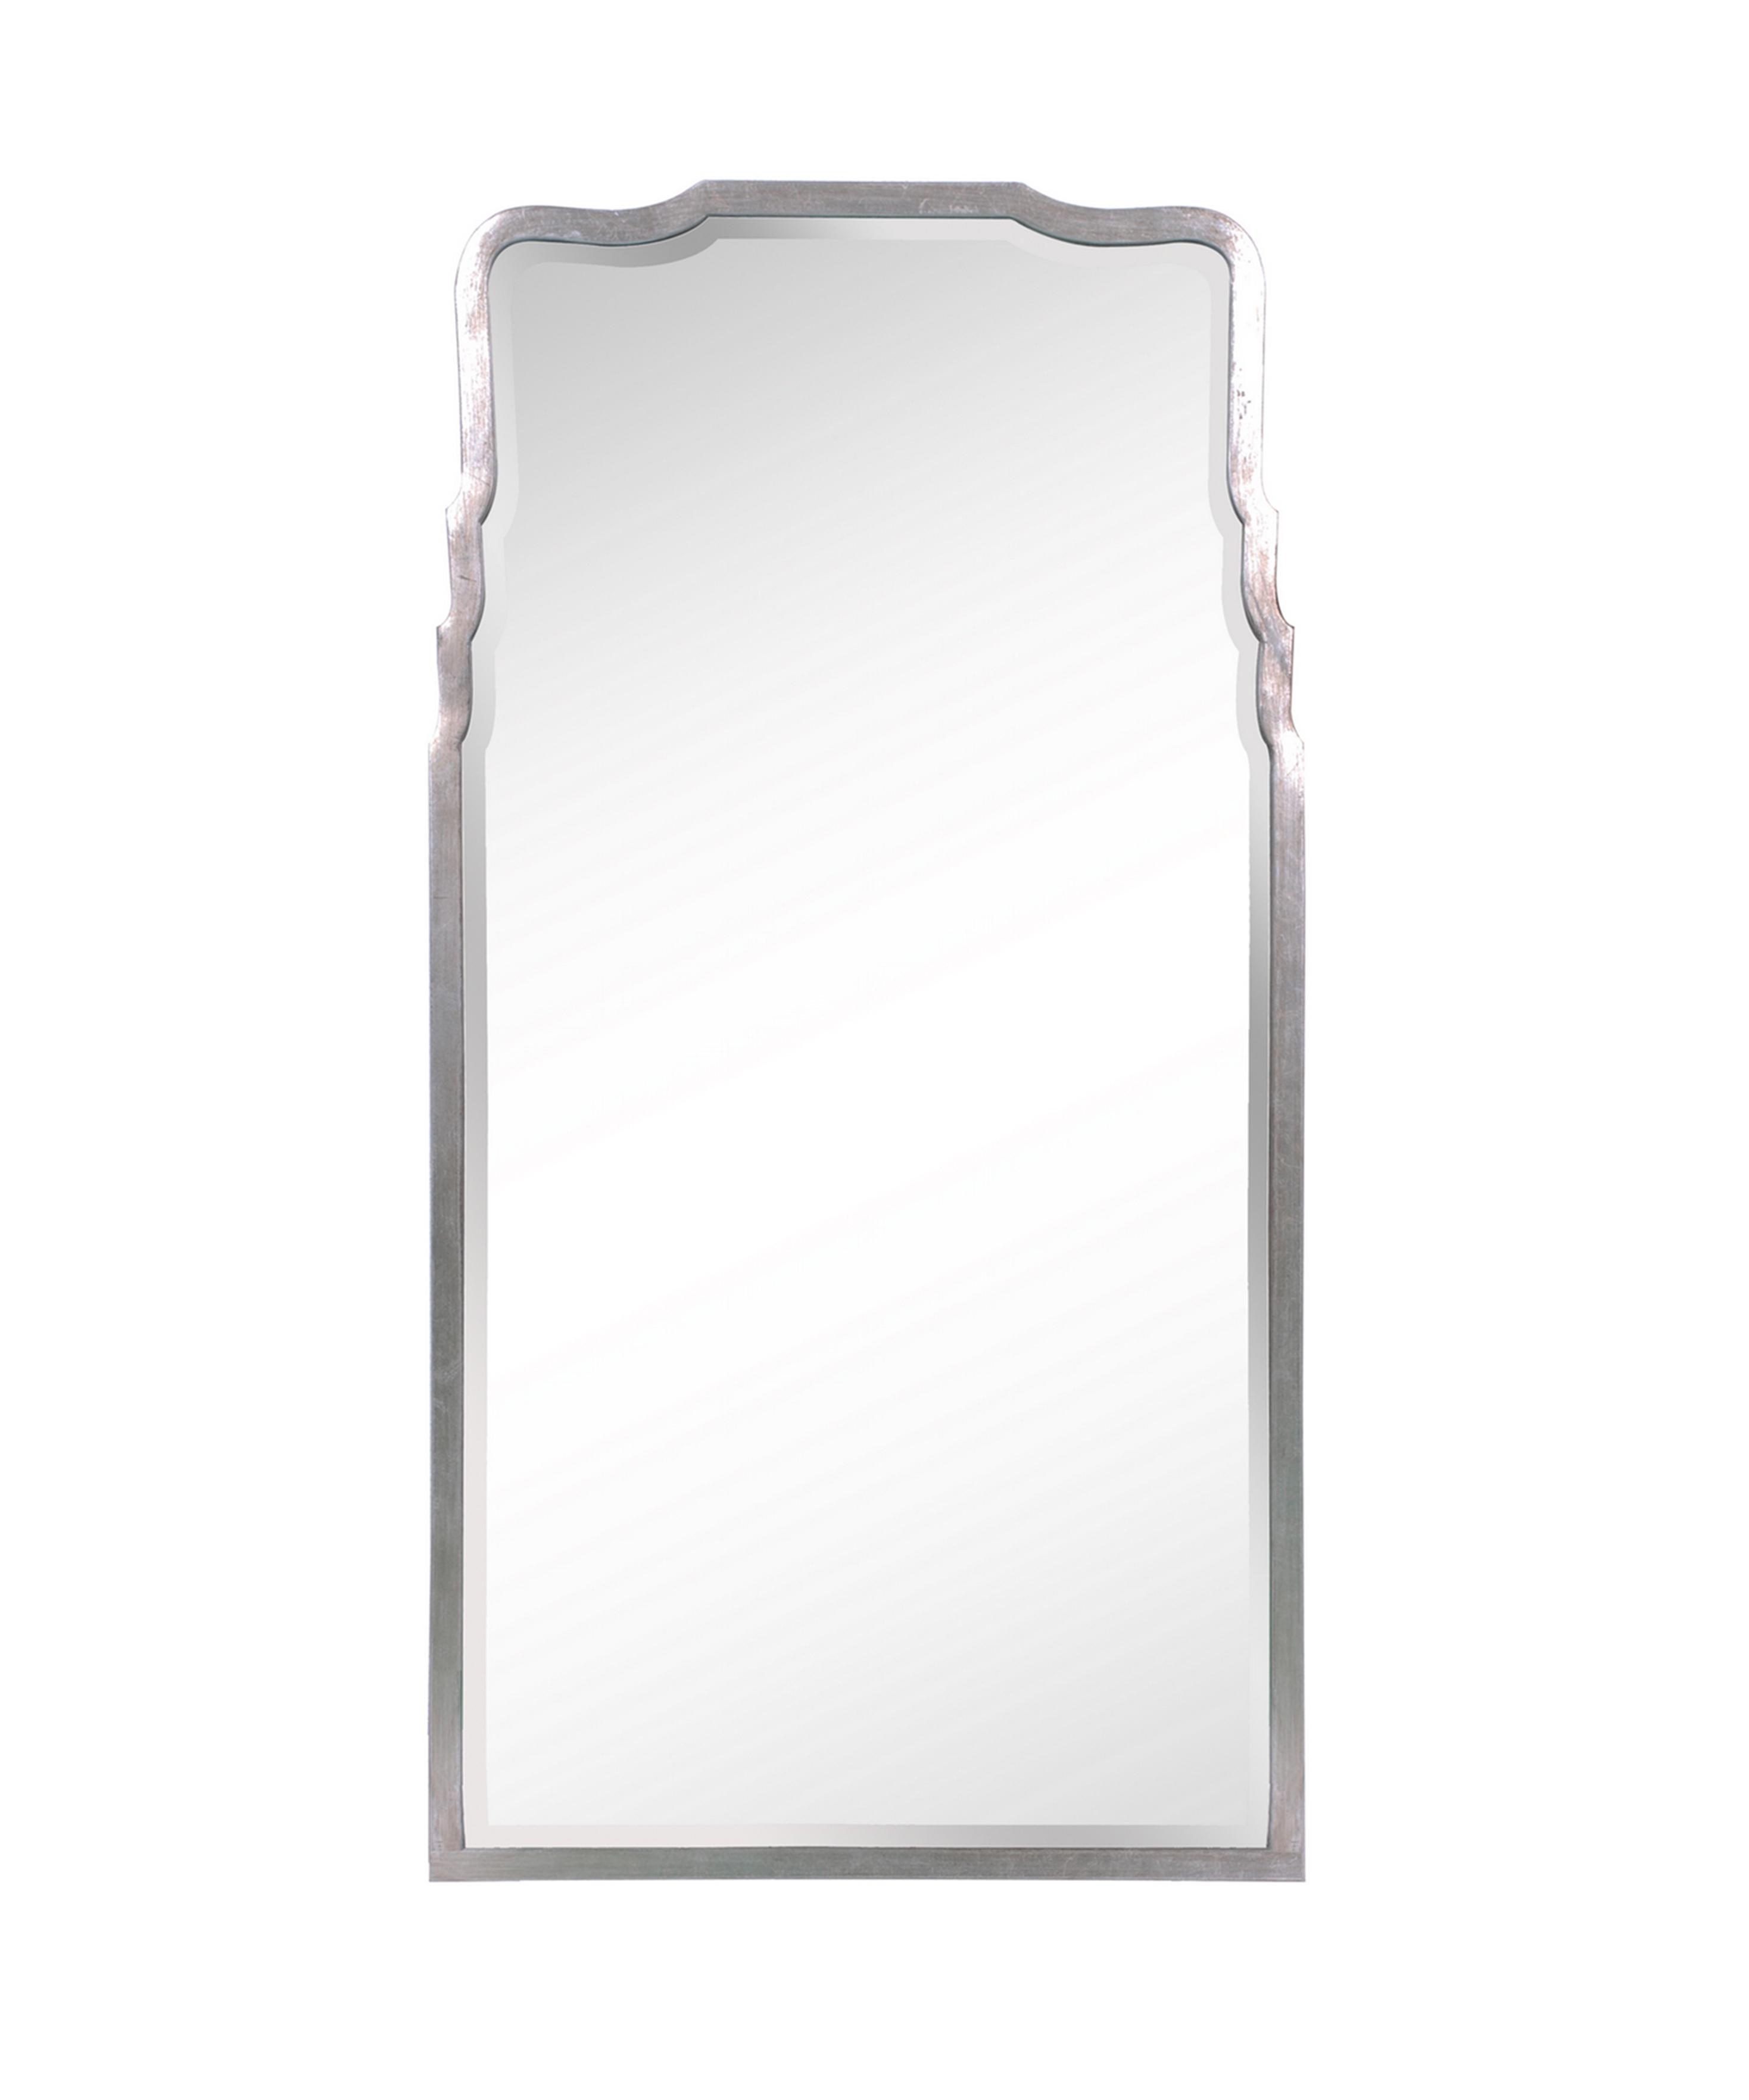 Kalvin Mirror